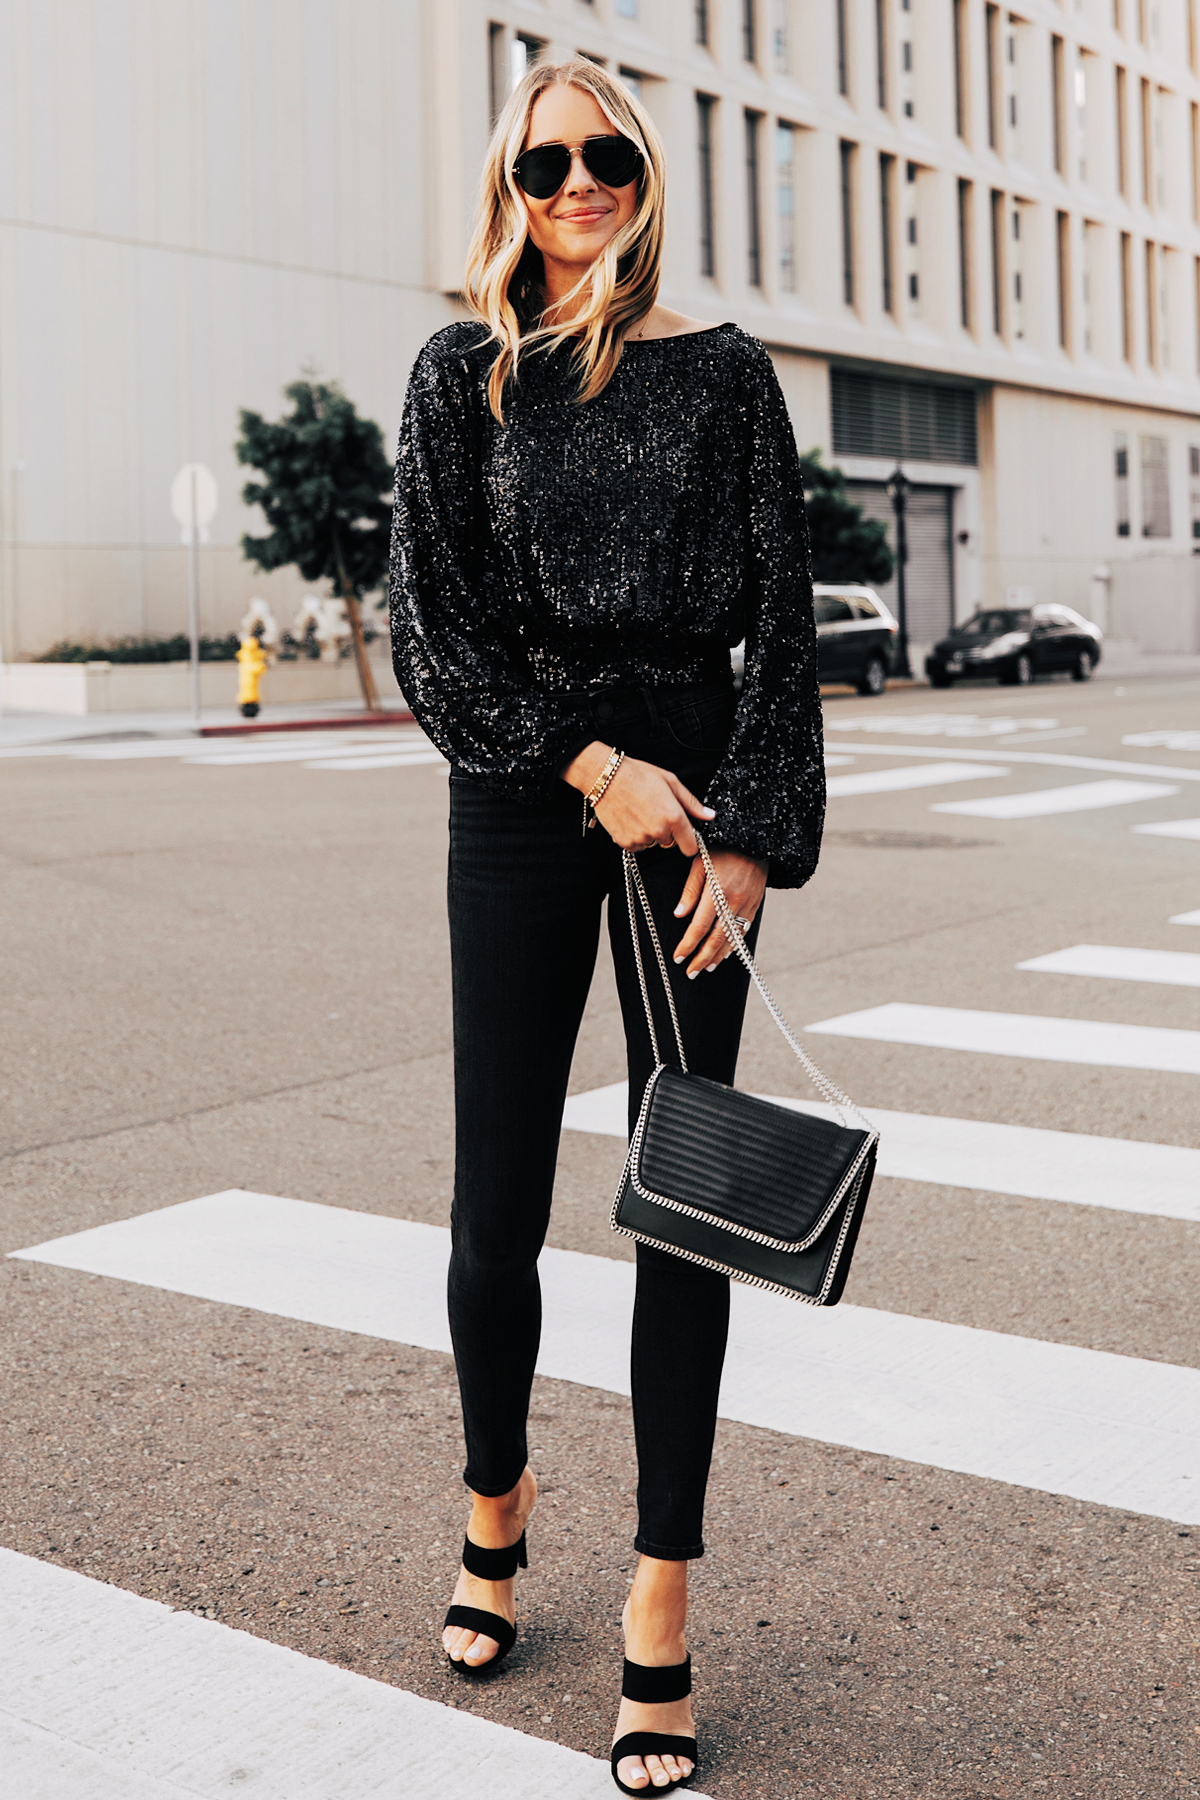 Fashion Jackson Wearing Black Sequin Top Black Jeans Black Heeled Sandals